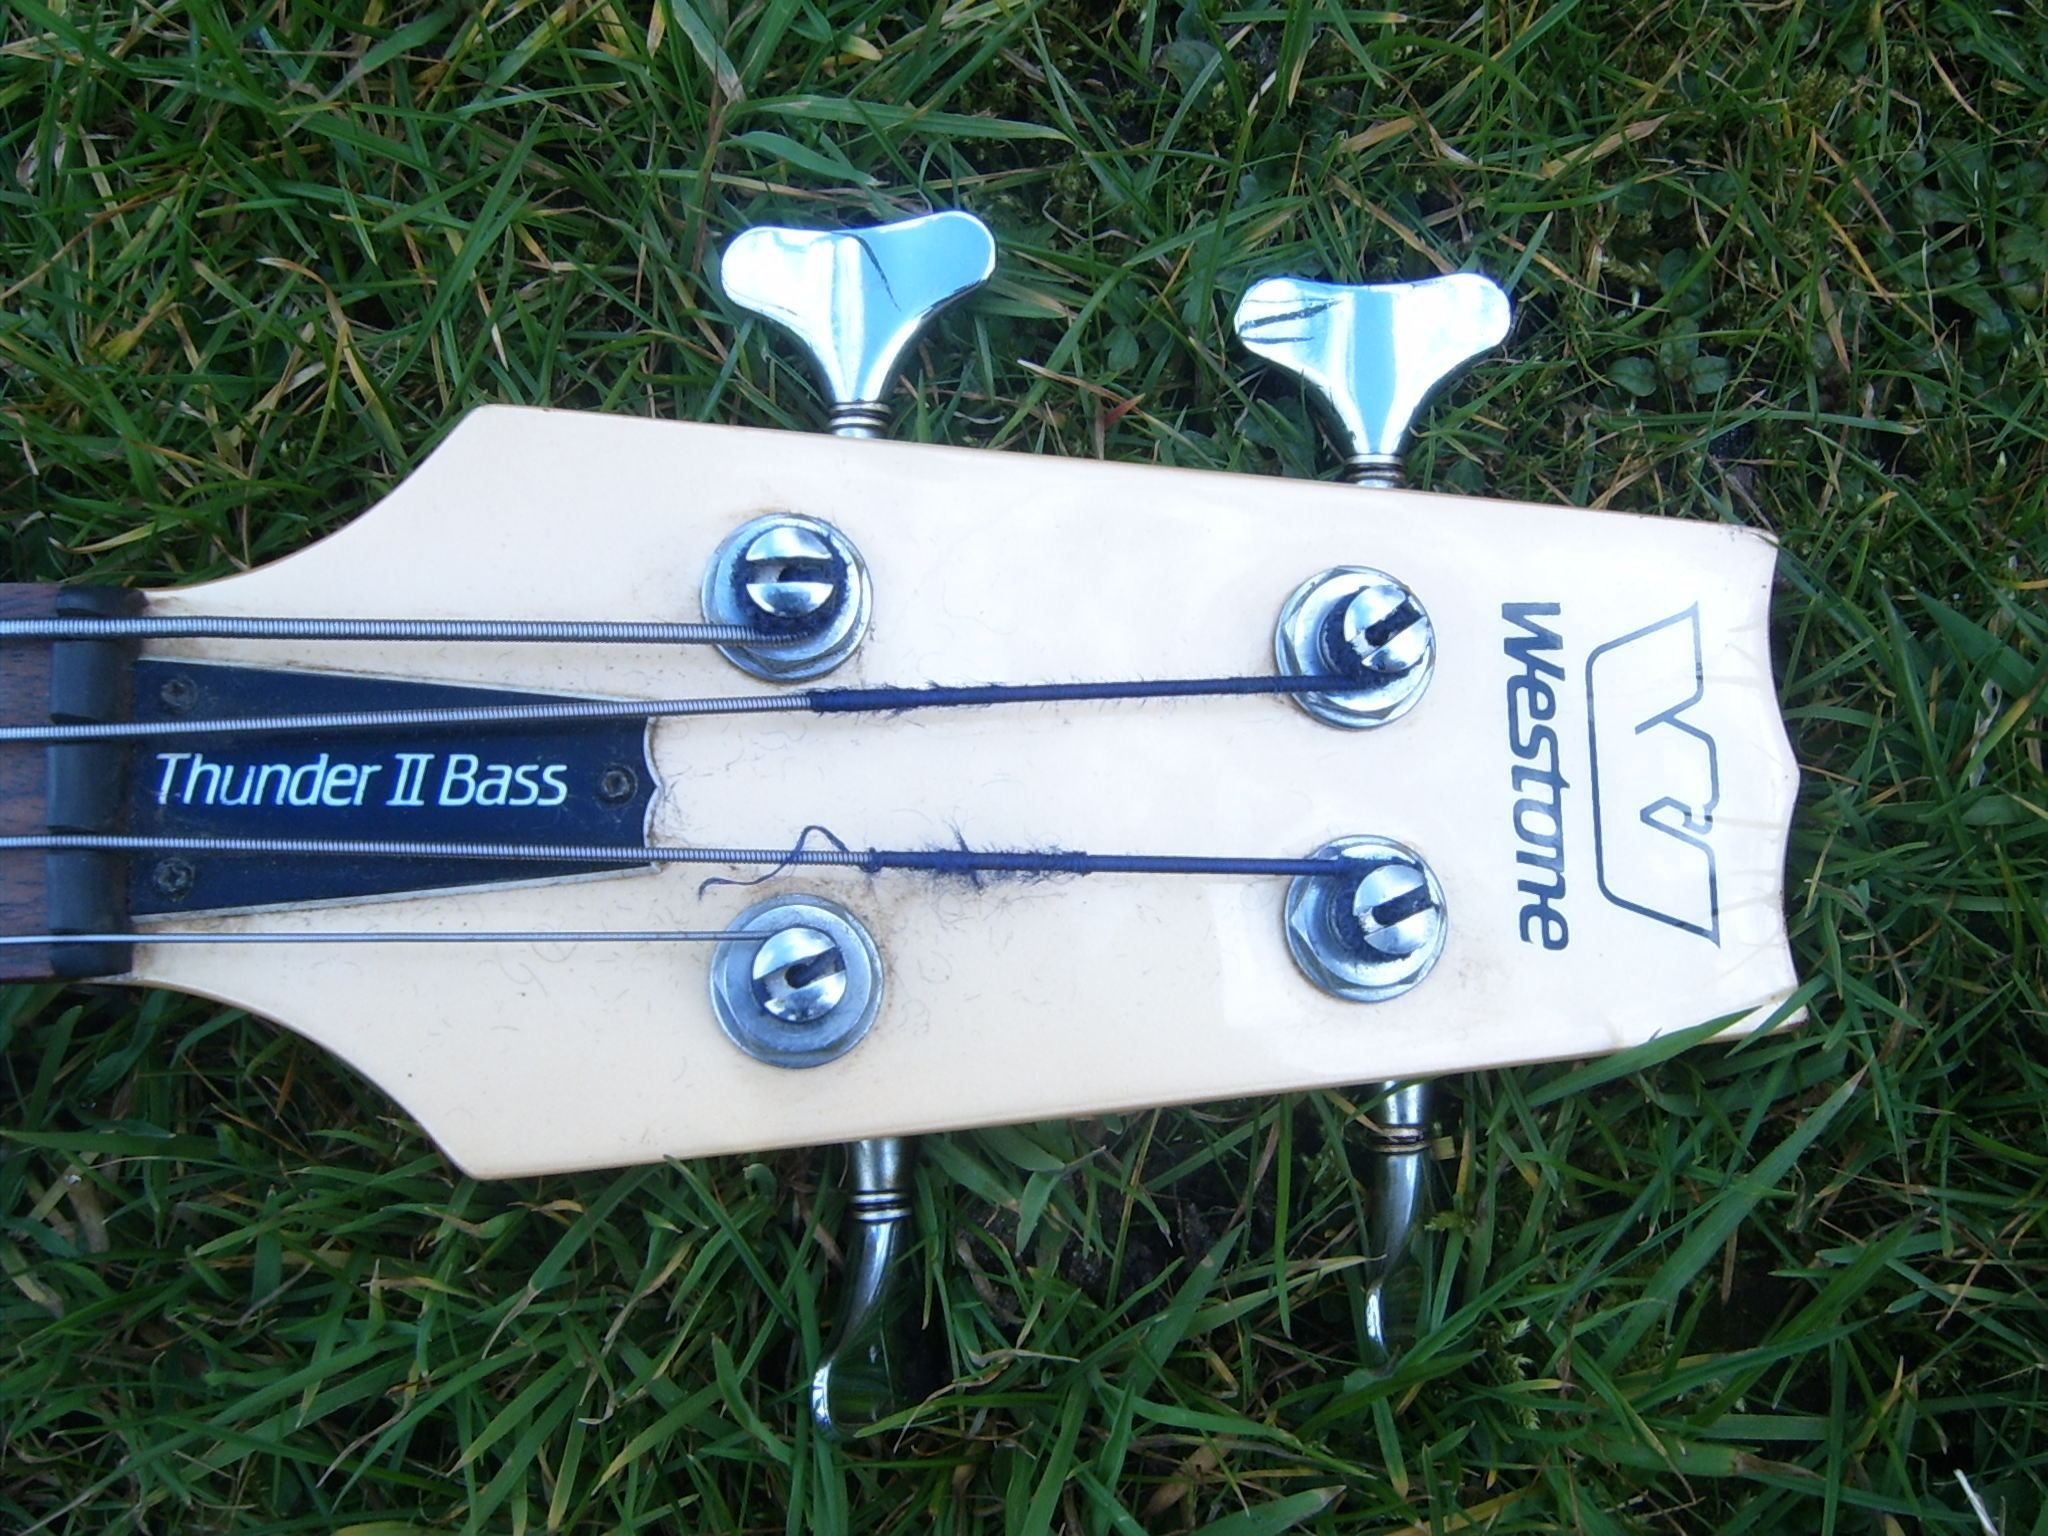 BASS - Westone Thunder ll Bass. Thunder 2. 68EF77